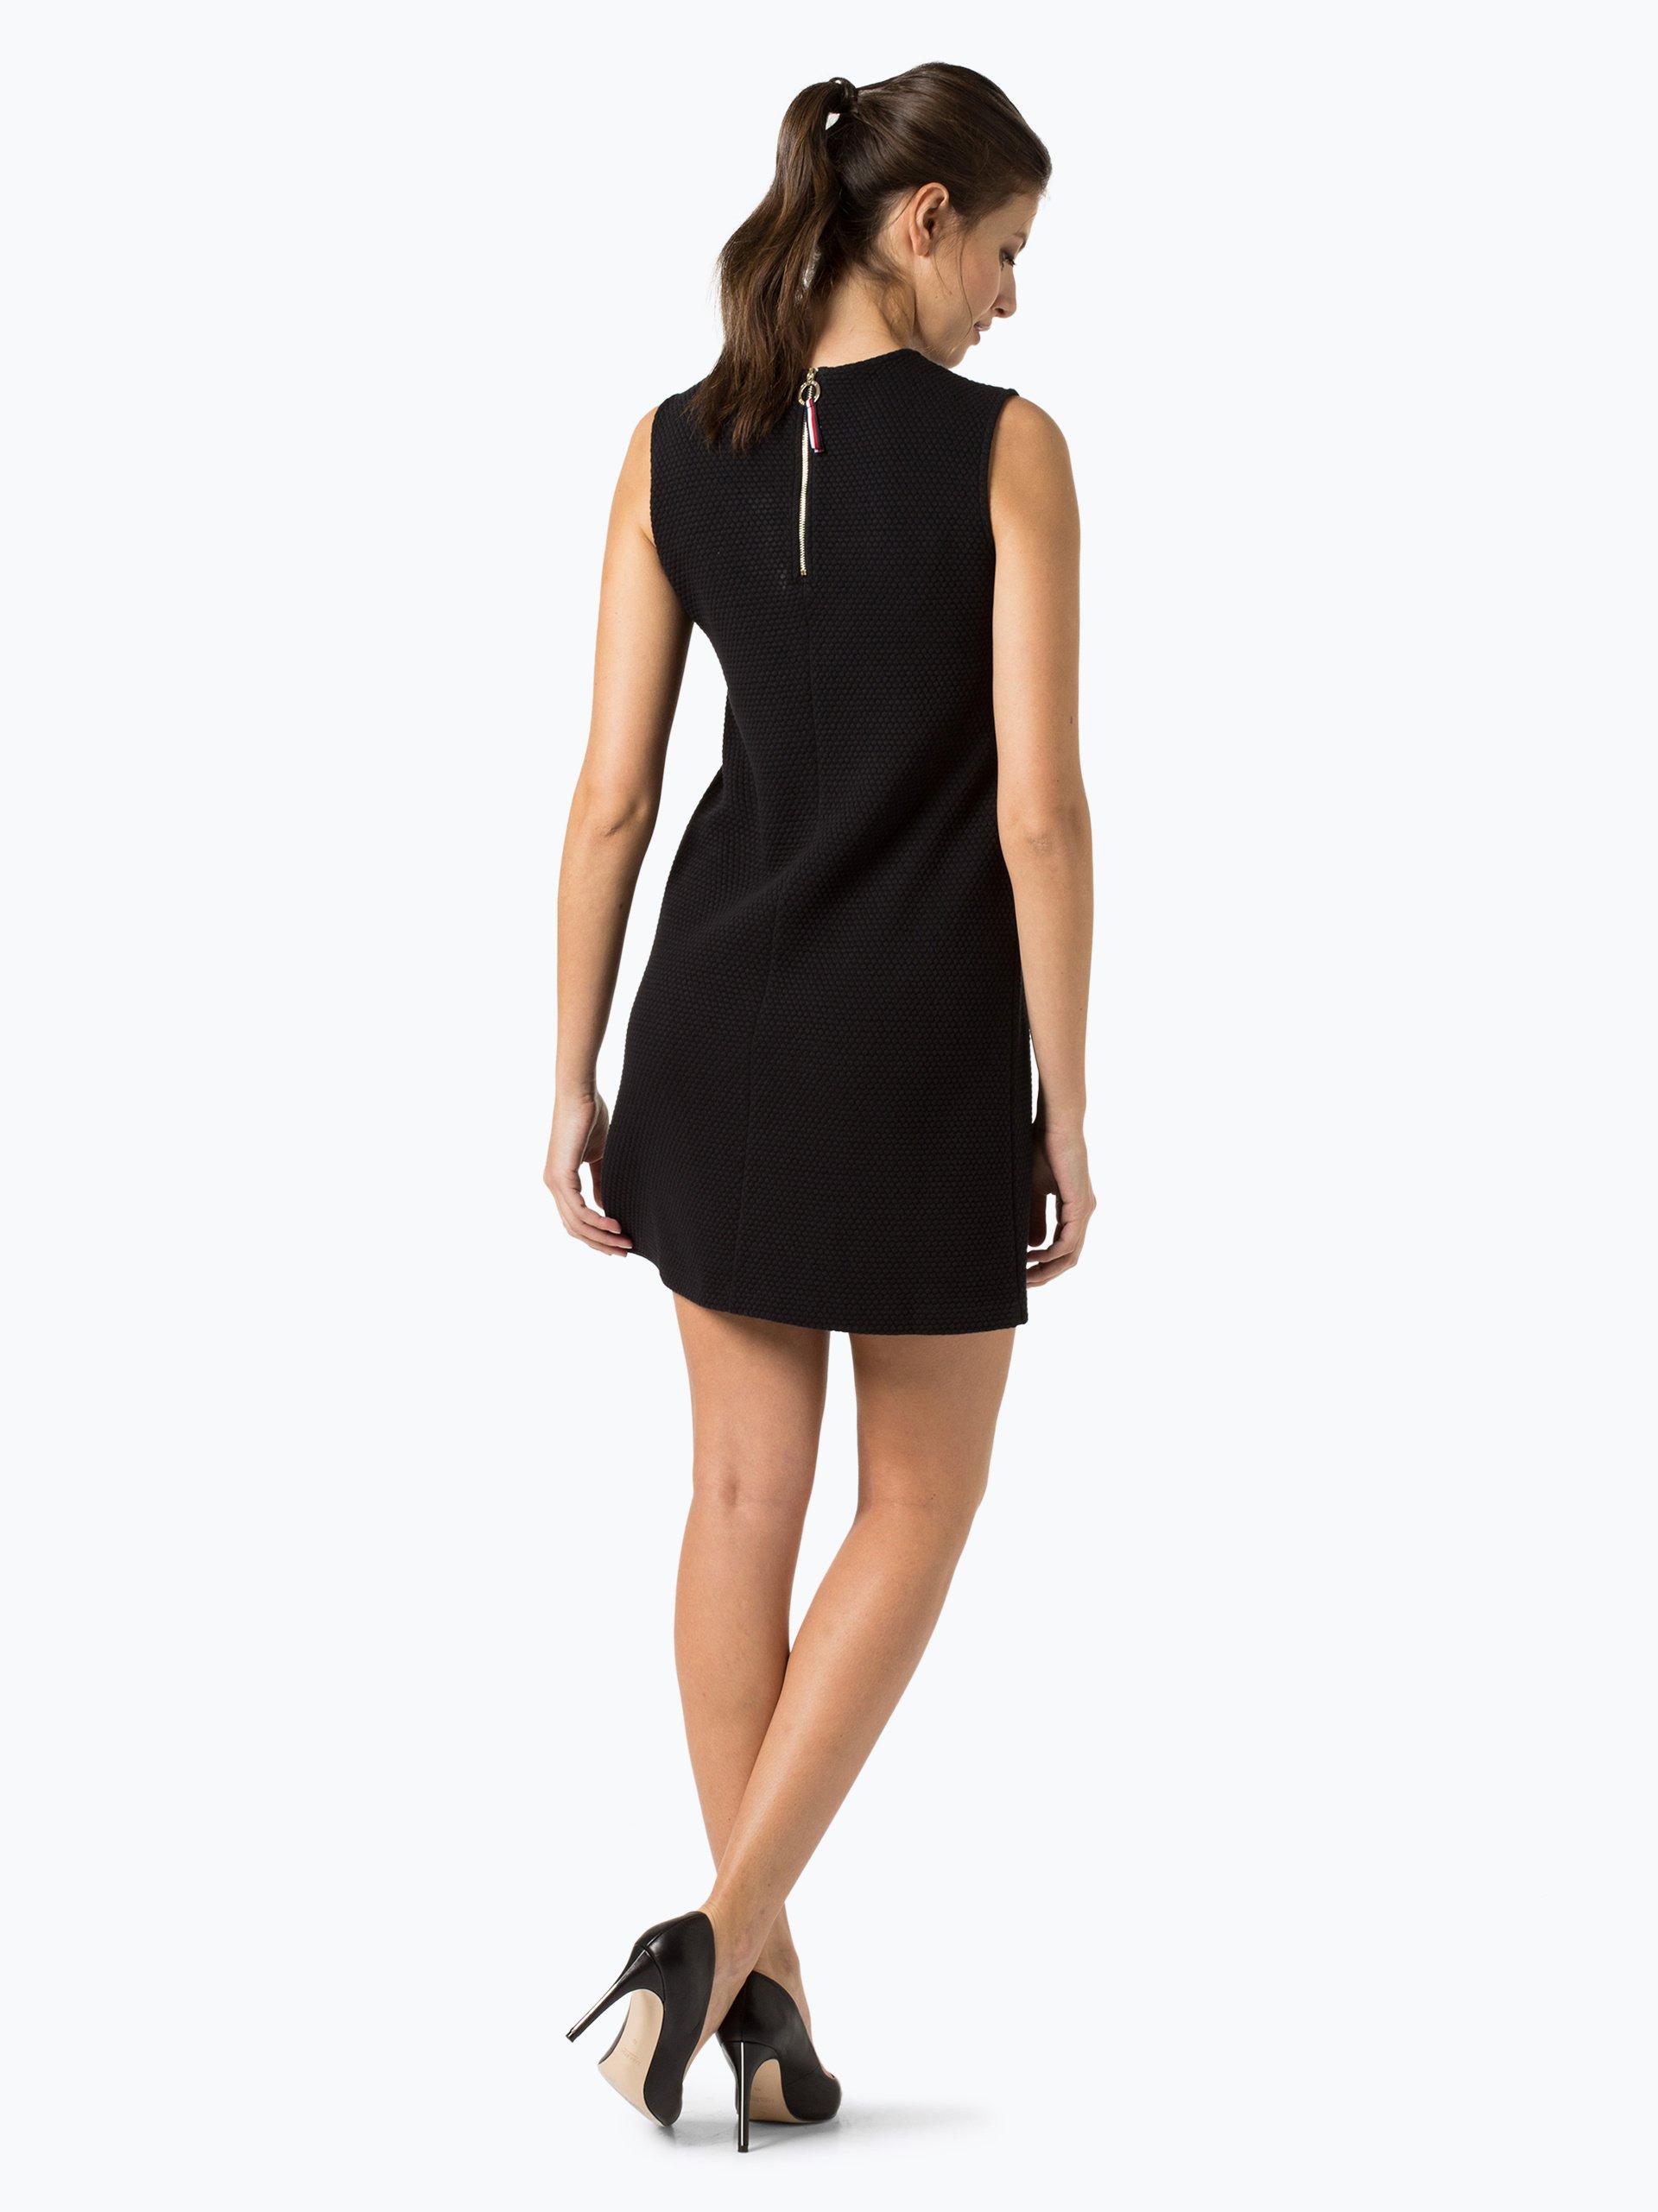 tommy hilfiger damen kleid schwarz uni online kaufen. Black Bedroom Furniture Sets. Home Design Ideas